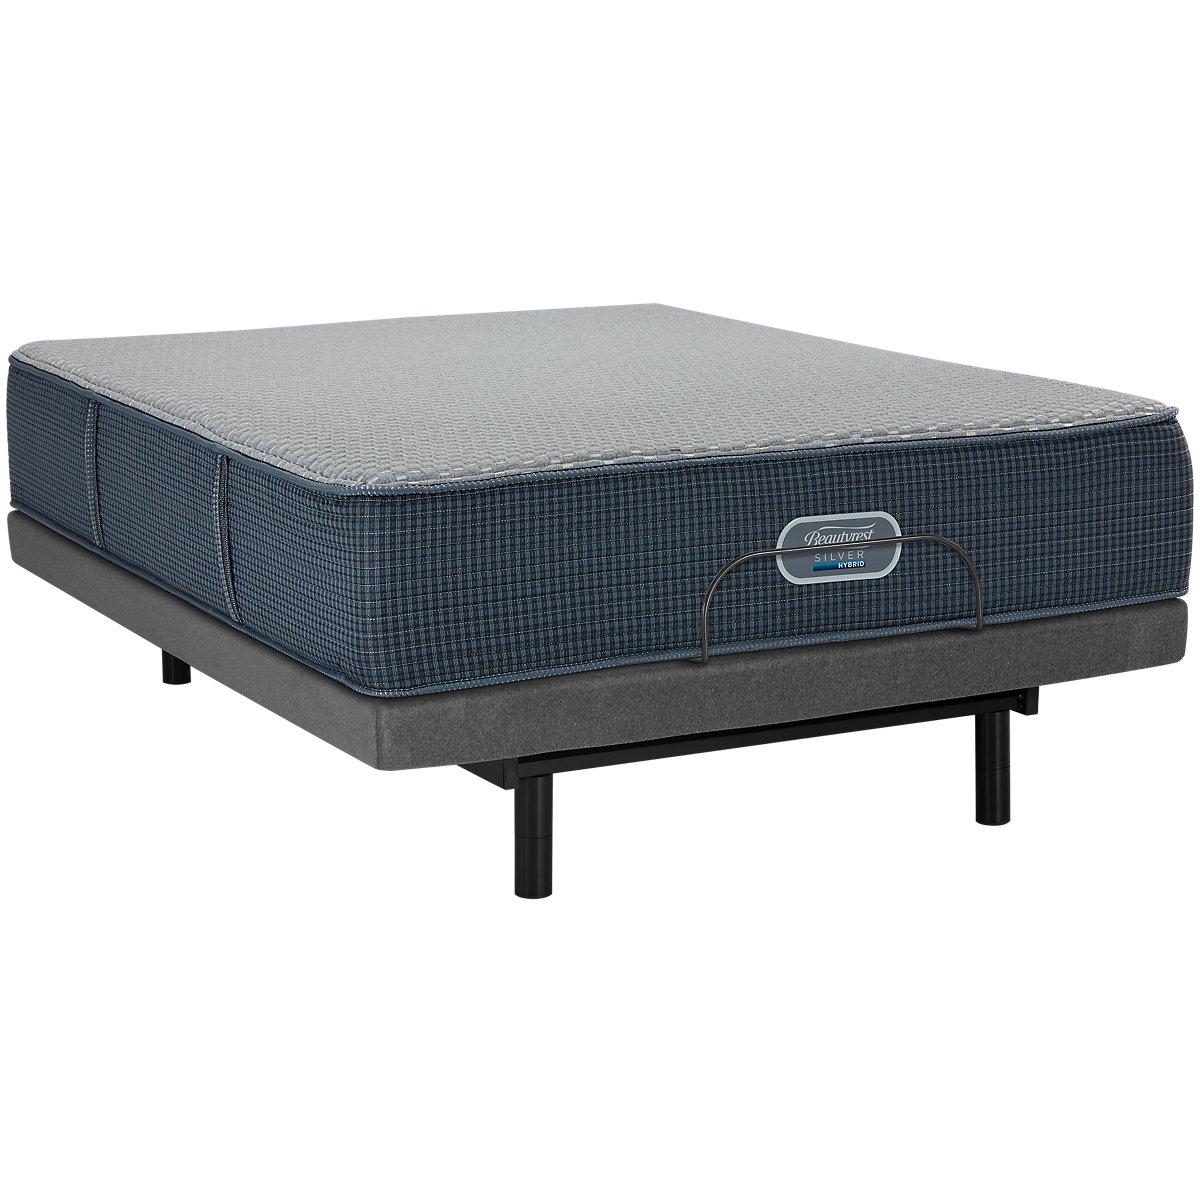 City Furniture Ventura Plush Hybrid Select Adjustable Mattress Set